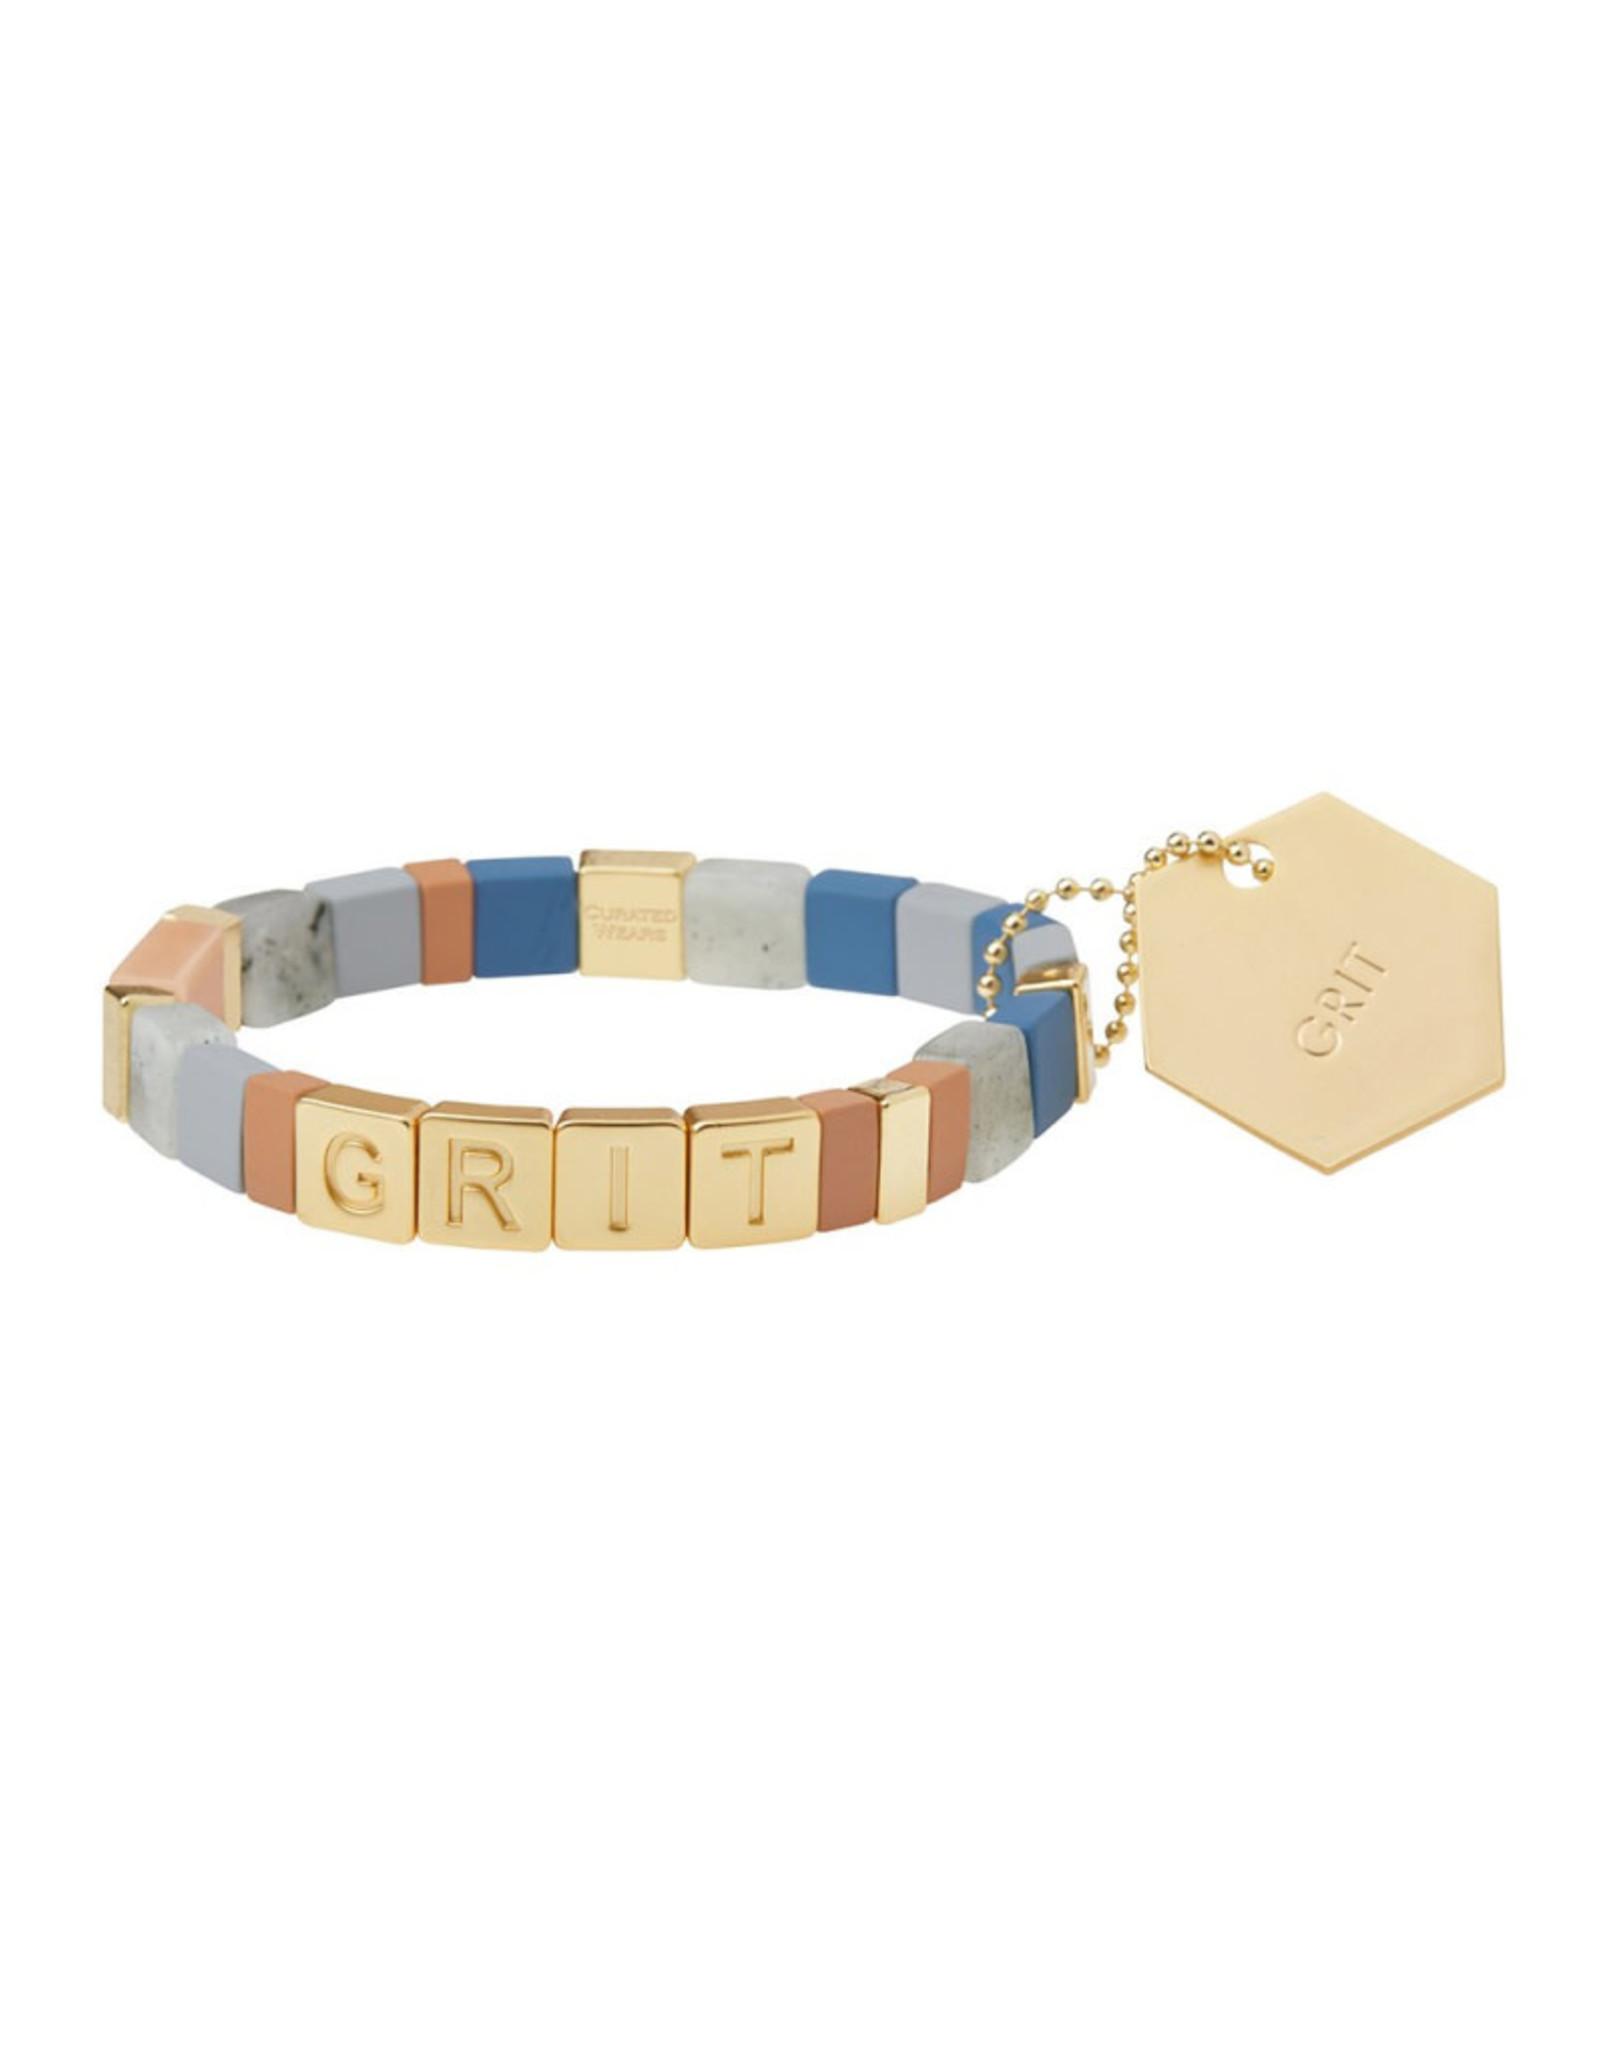 "Empower Bracelet - ""Grit"" - Gold/Labradorite/Sunstone"